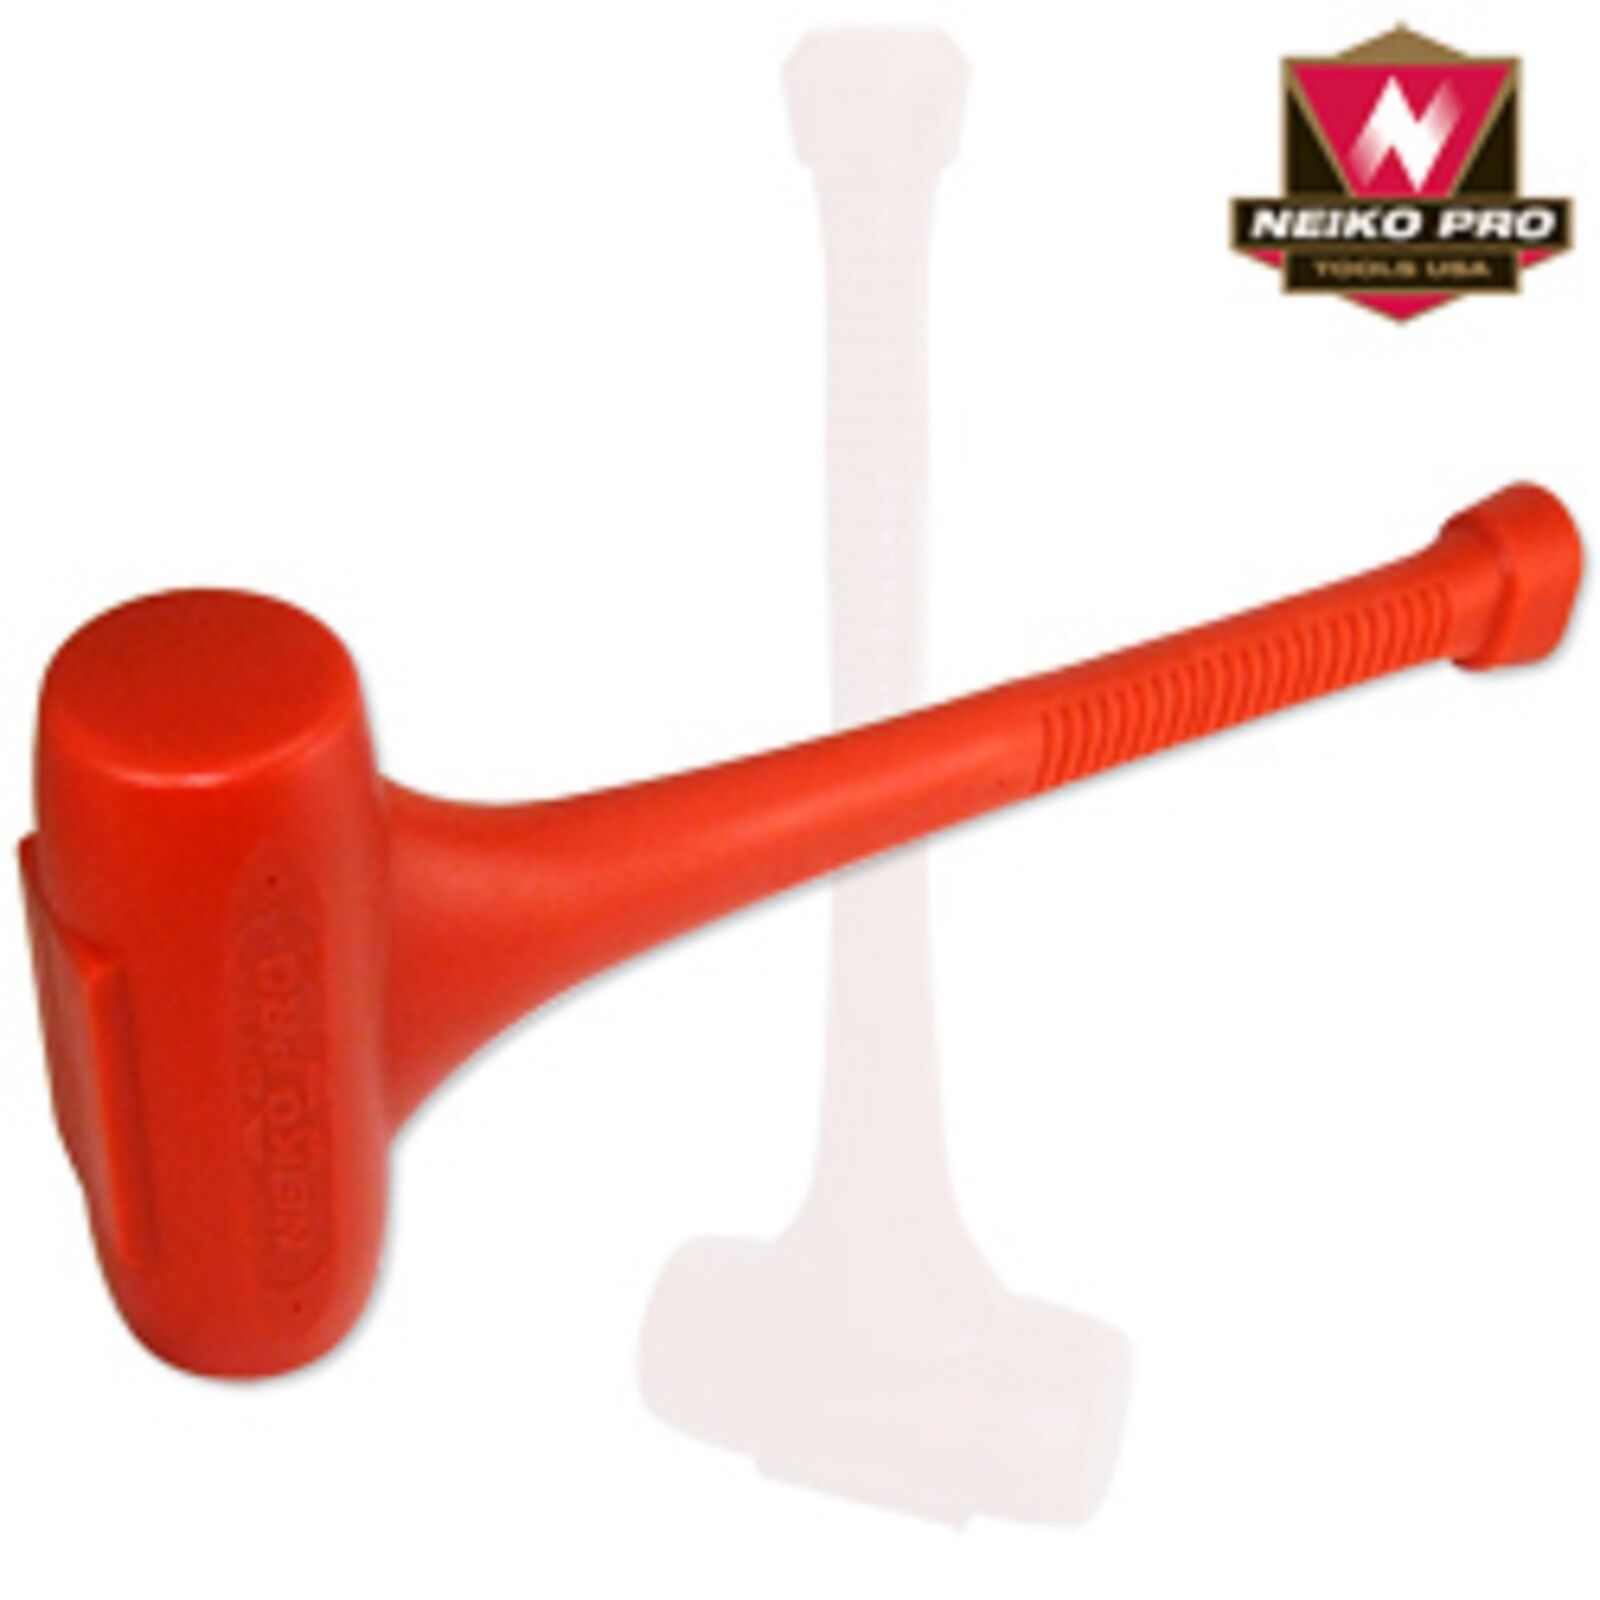 Neiko Pro Dead Blow Hammer 12Lb 36 1/2